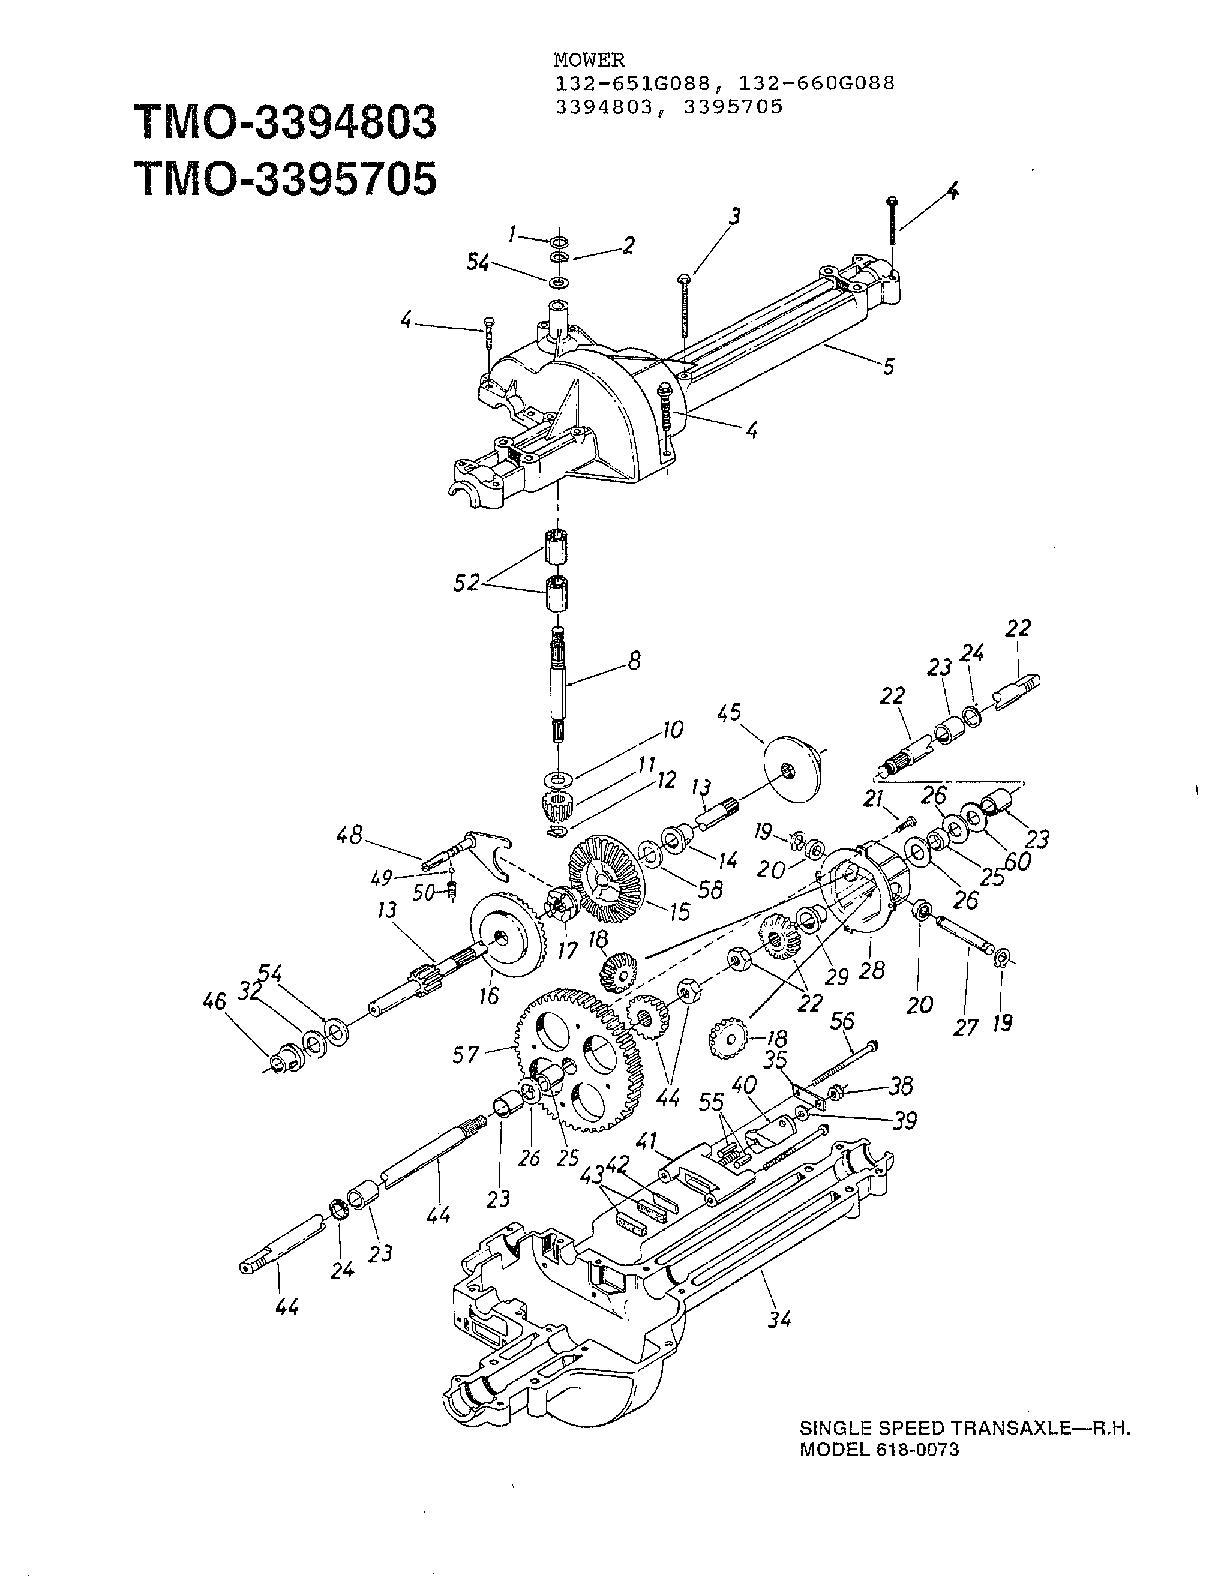 Mtd  Lawn Mower  Single speed transaxle-r